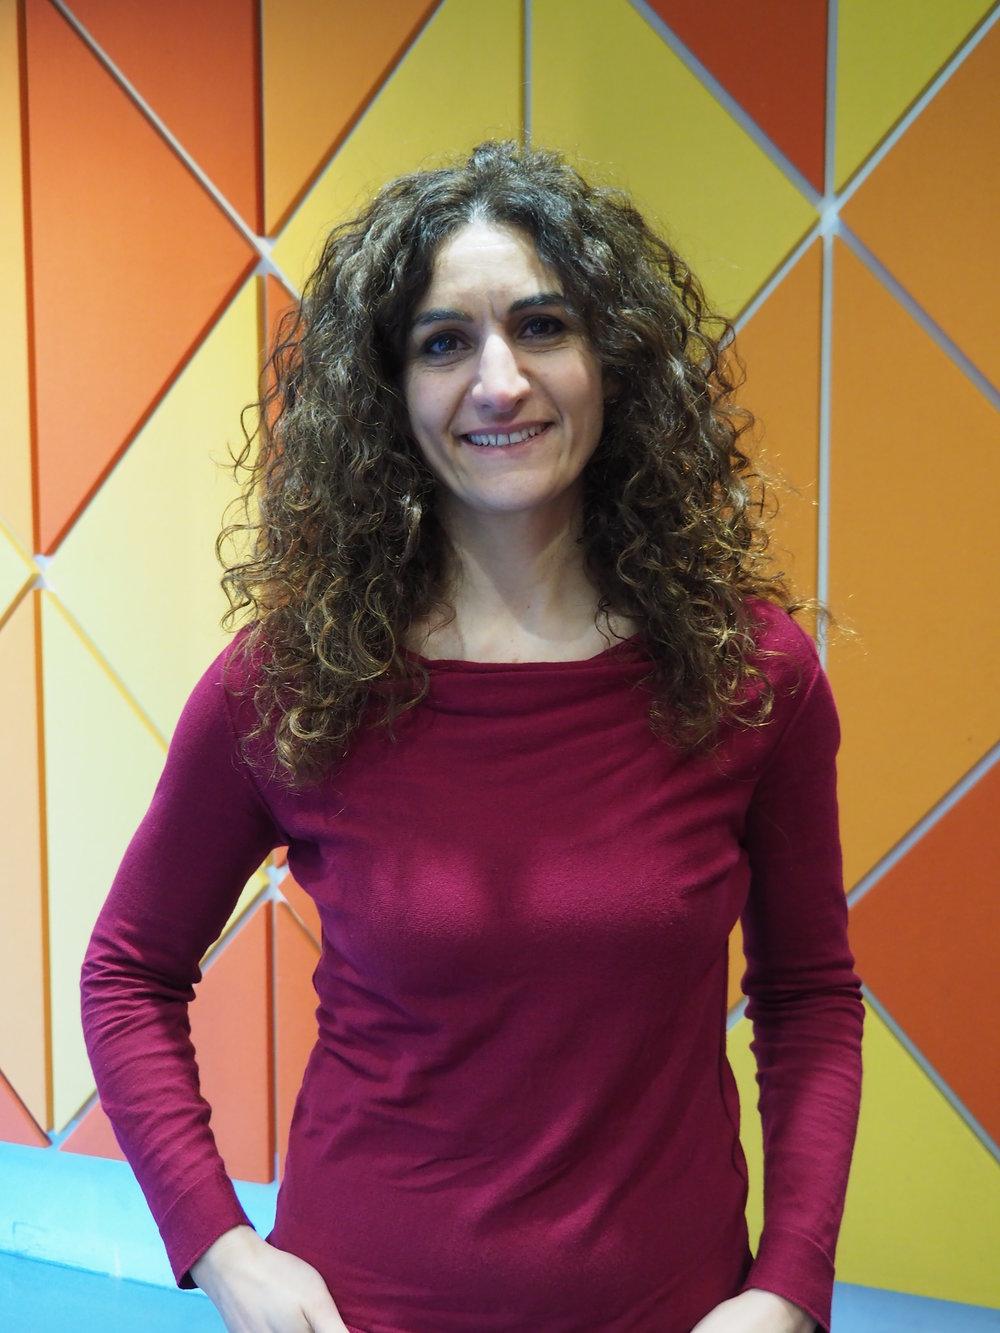 Rania Tarazi - Living in: Amman, JordanNationality: Jordanian